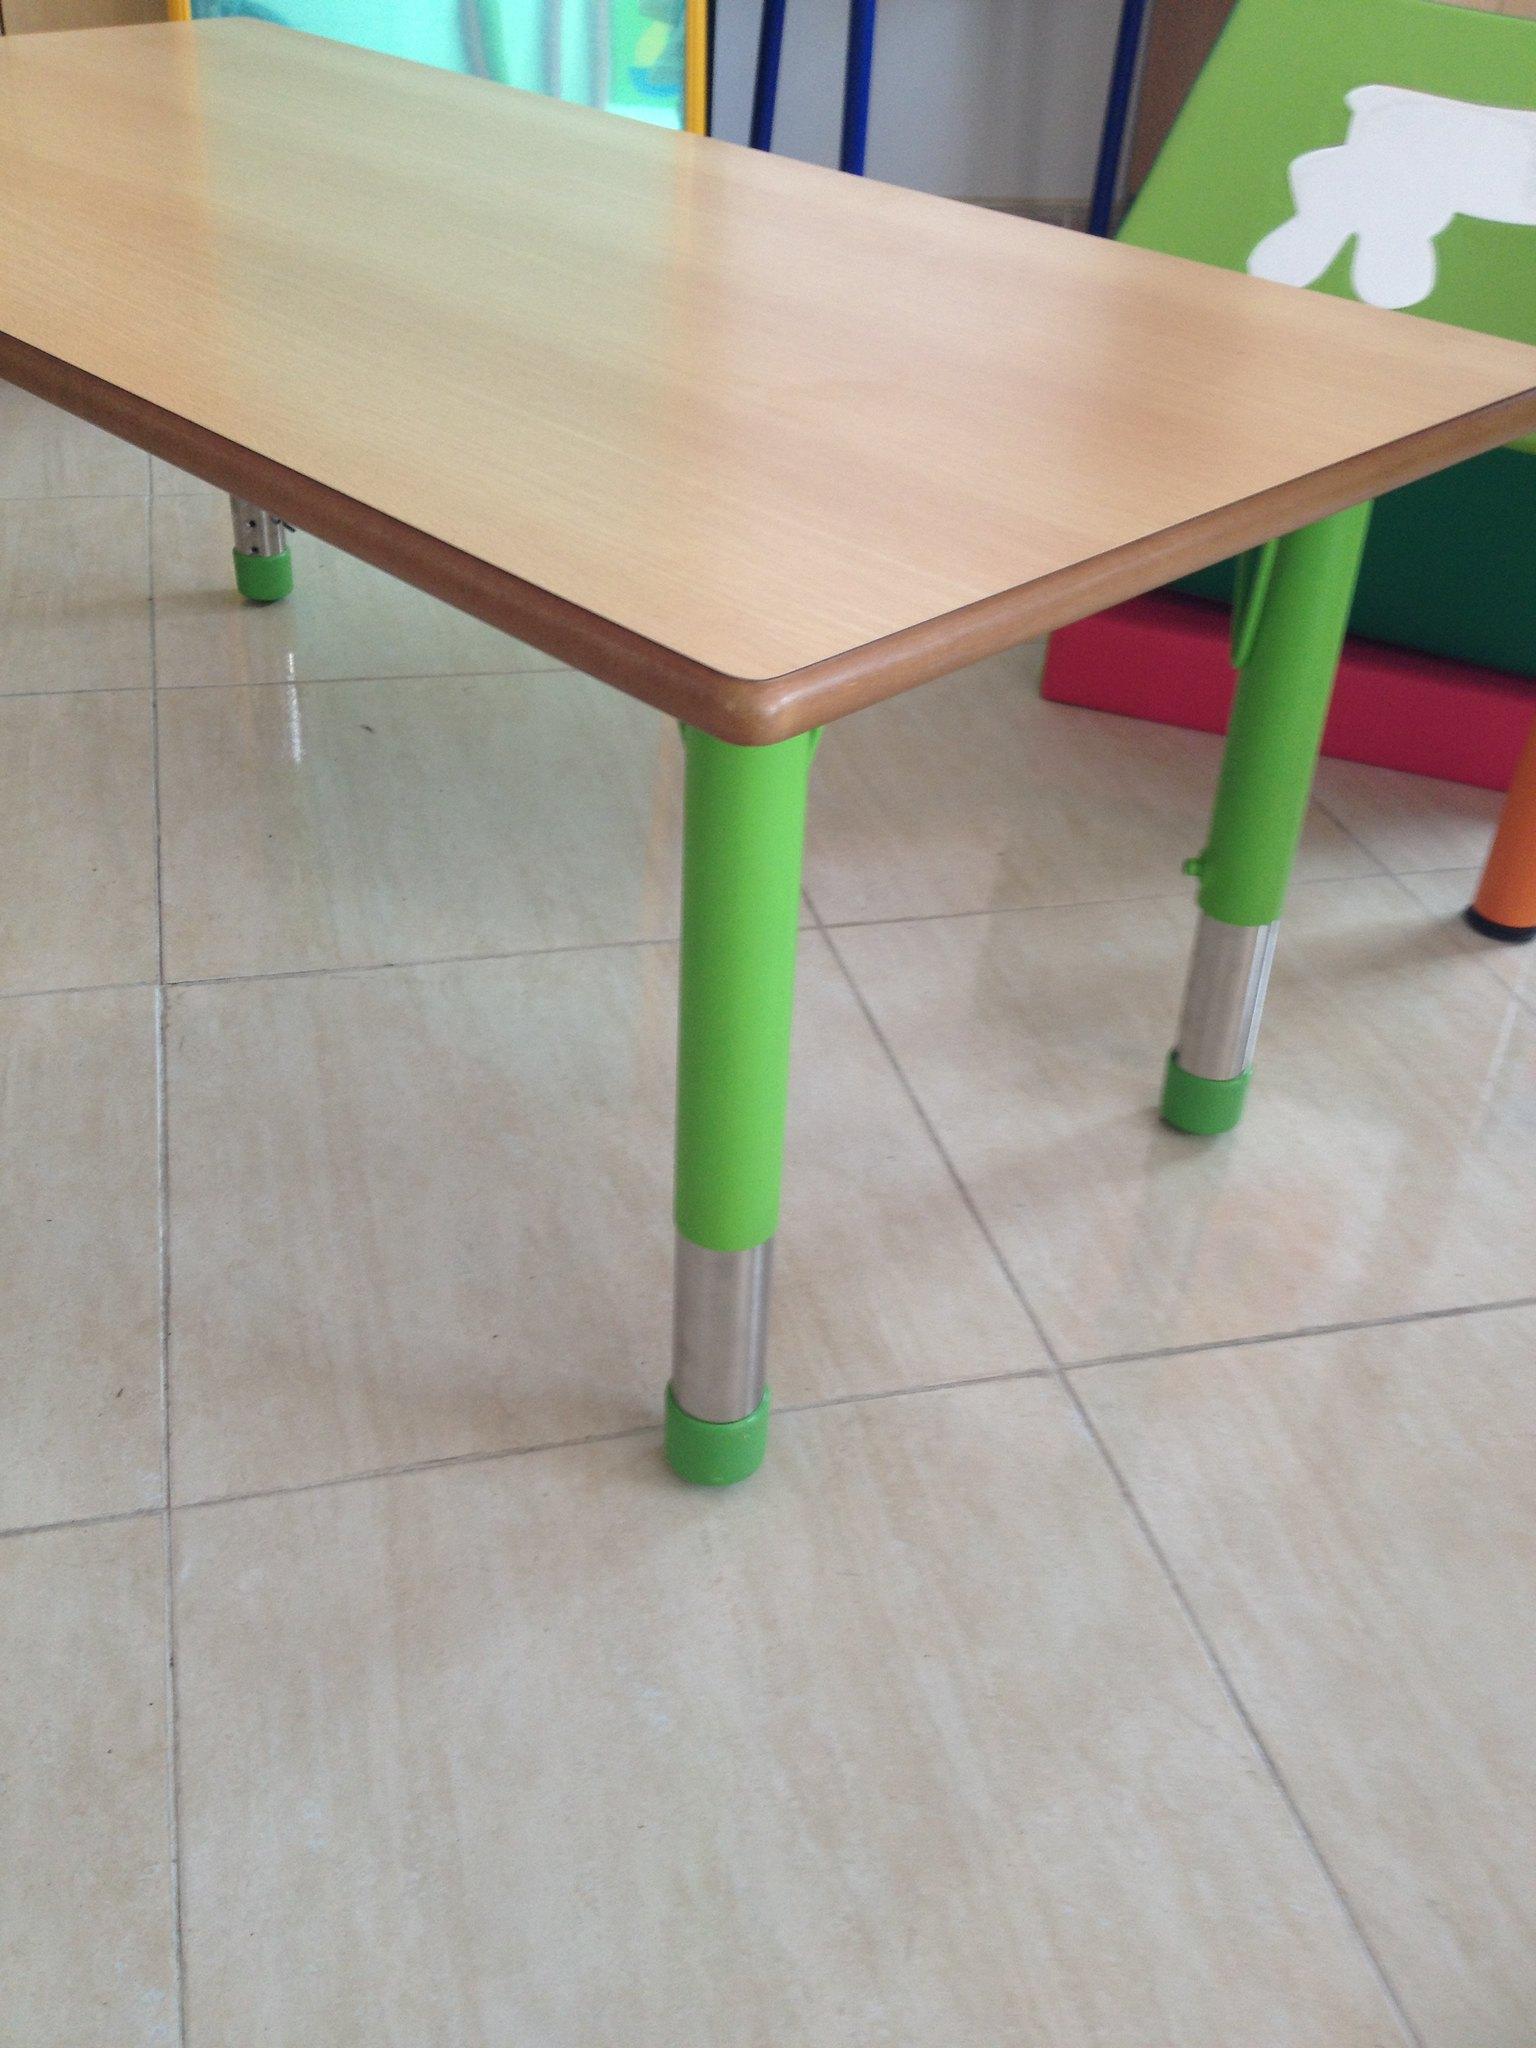 Mobiliario guarderia mobiliario escolar flickr for Mobiliario 2 mao